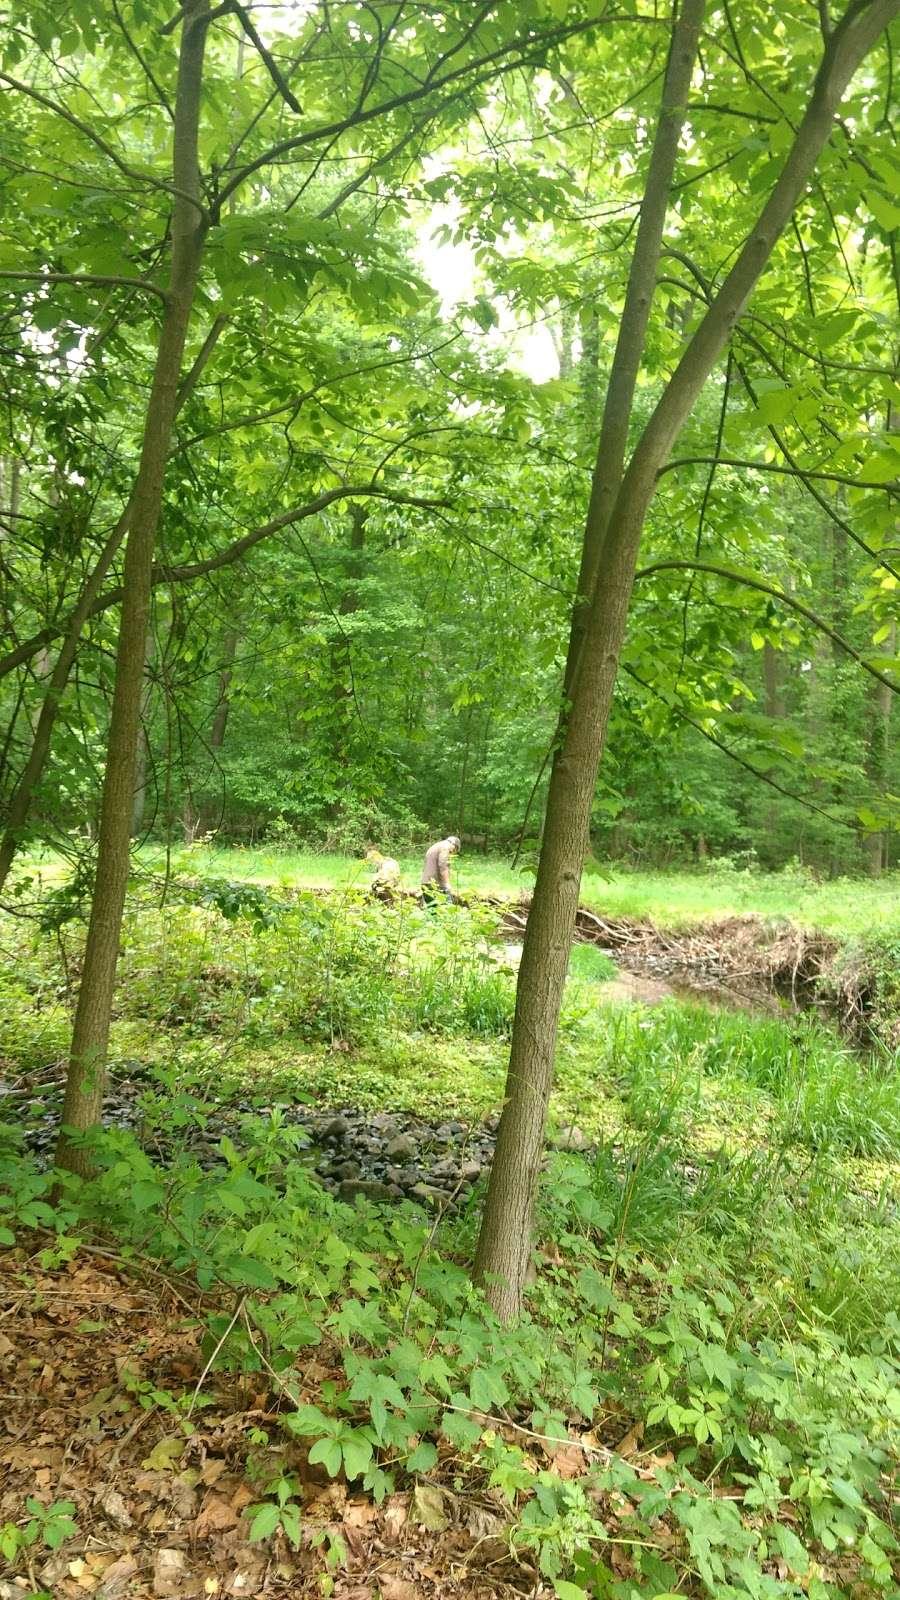 Flat Rock Brook Nature Center - park  | Photo 8 of 10 | Address: 288 Jones Rd, Englewood, NJ 07631, USA